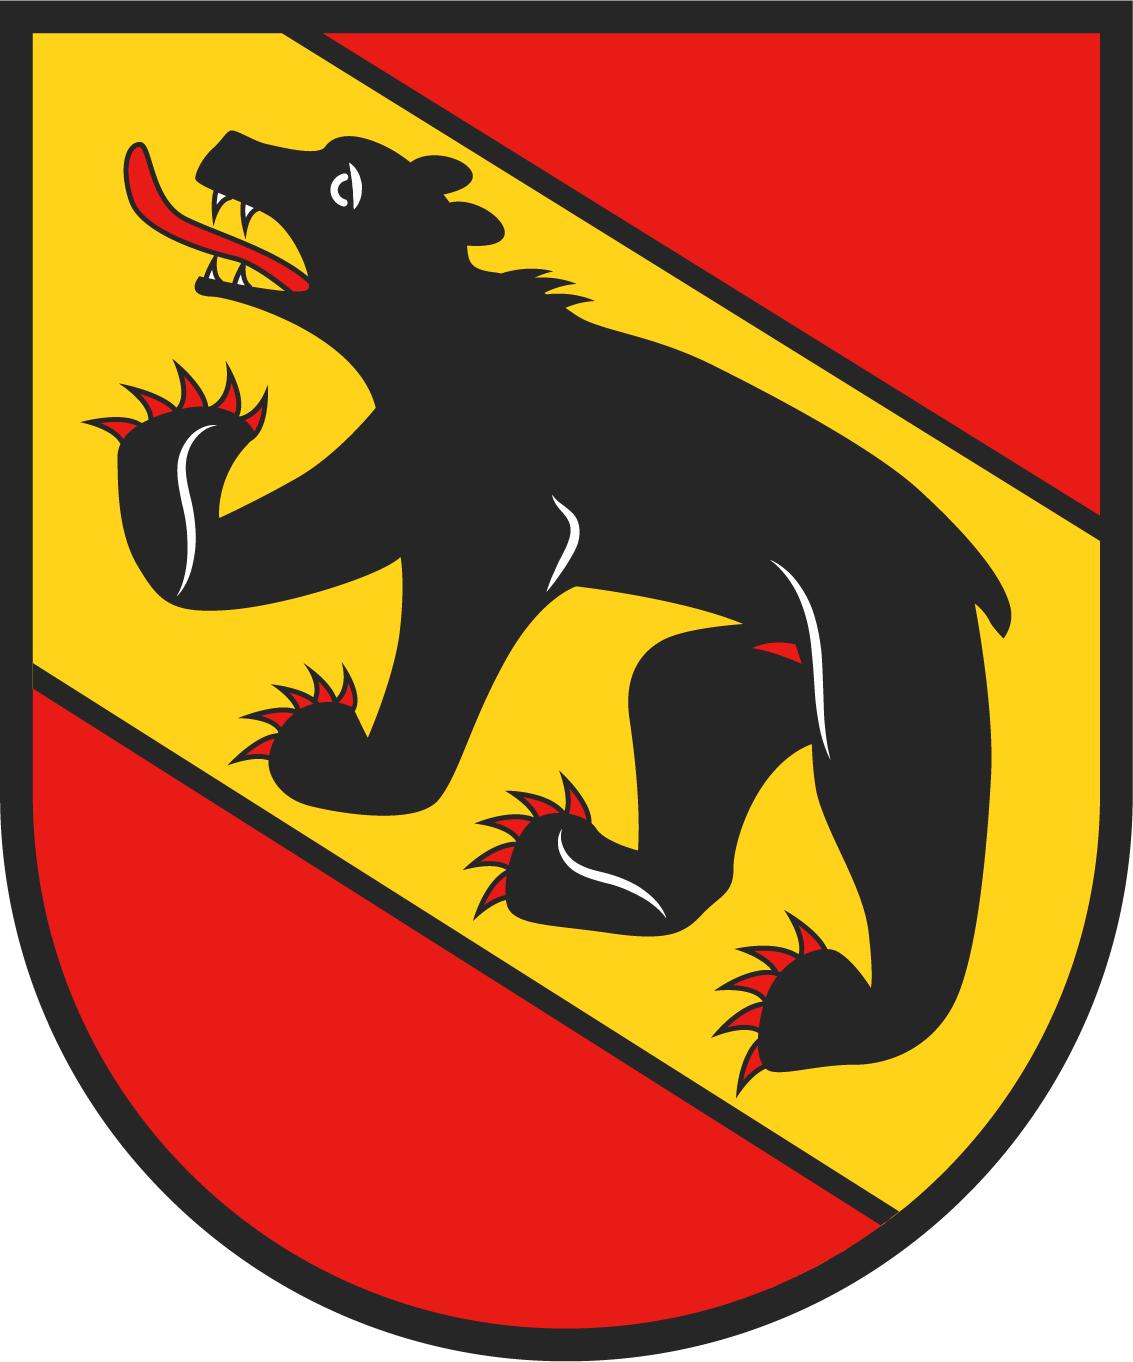 Wappen des Kantons Bern